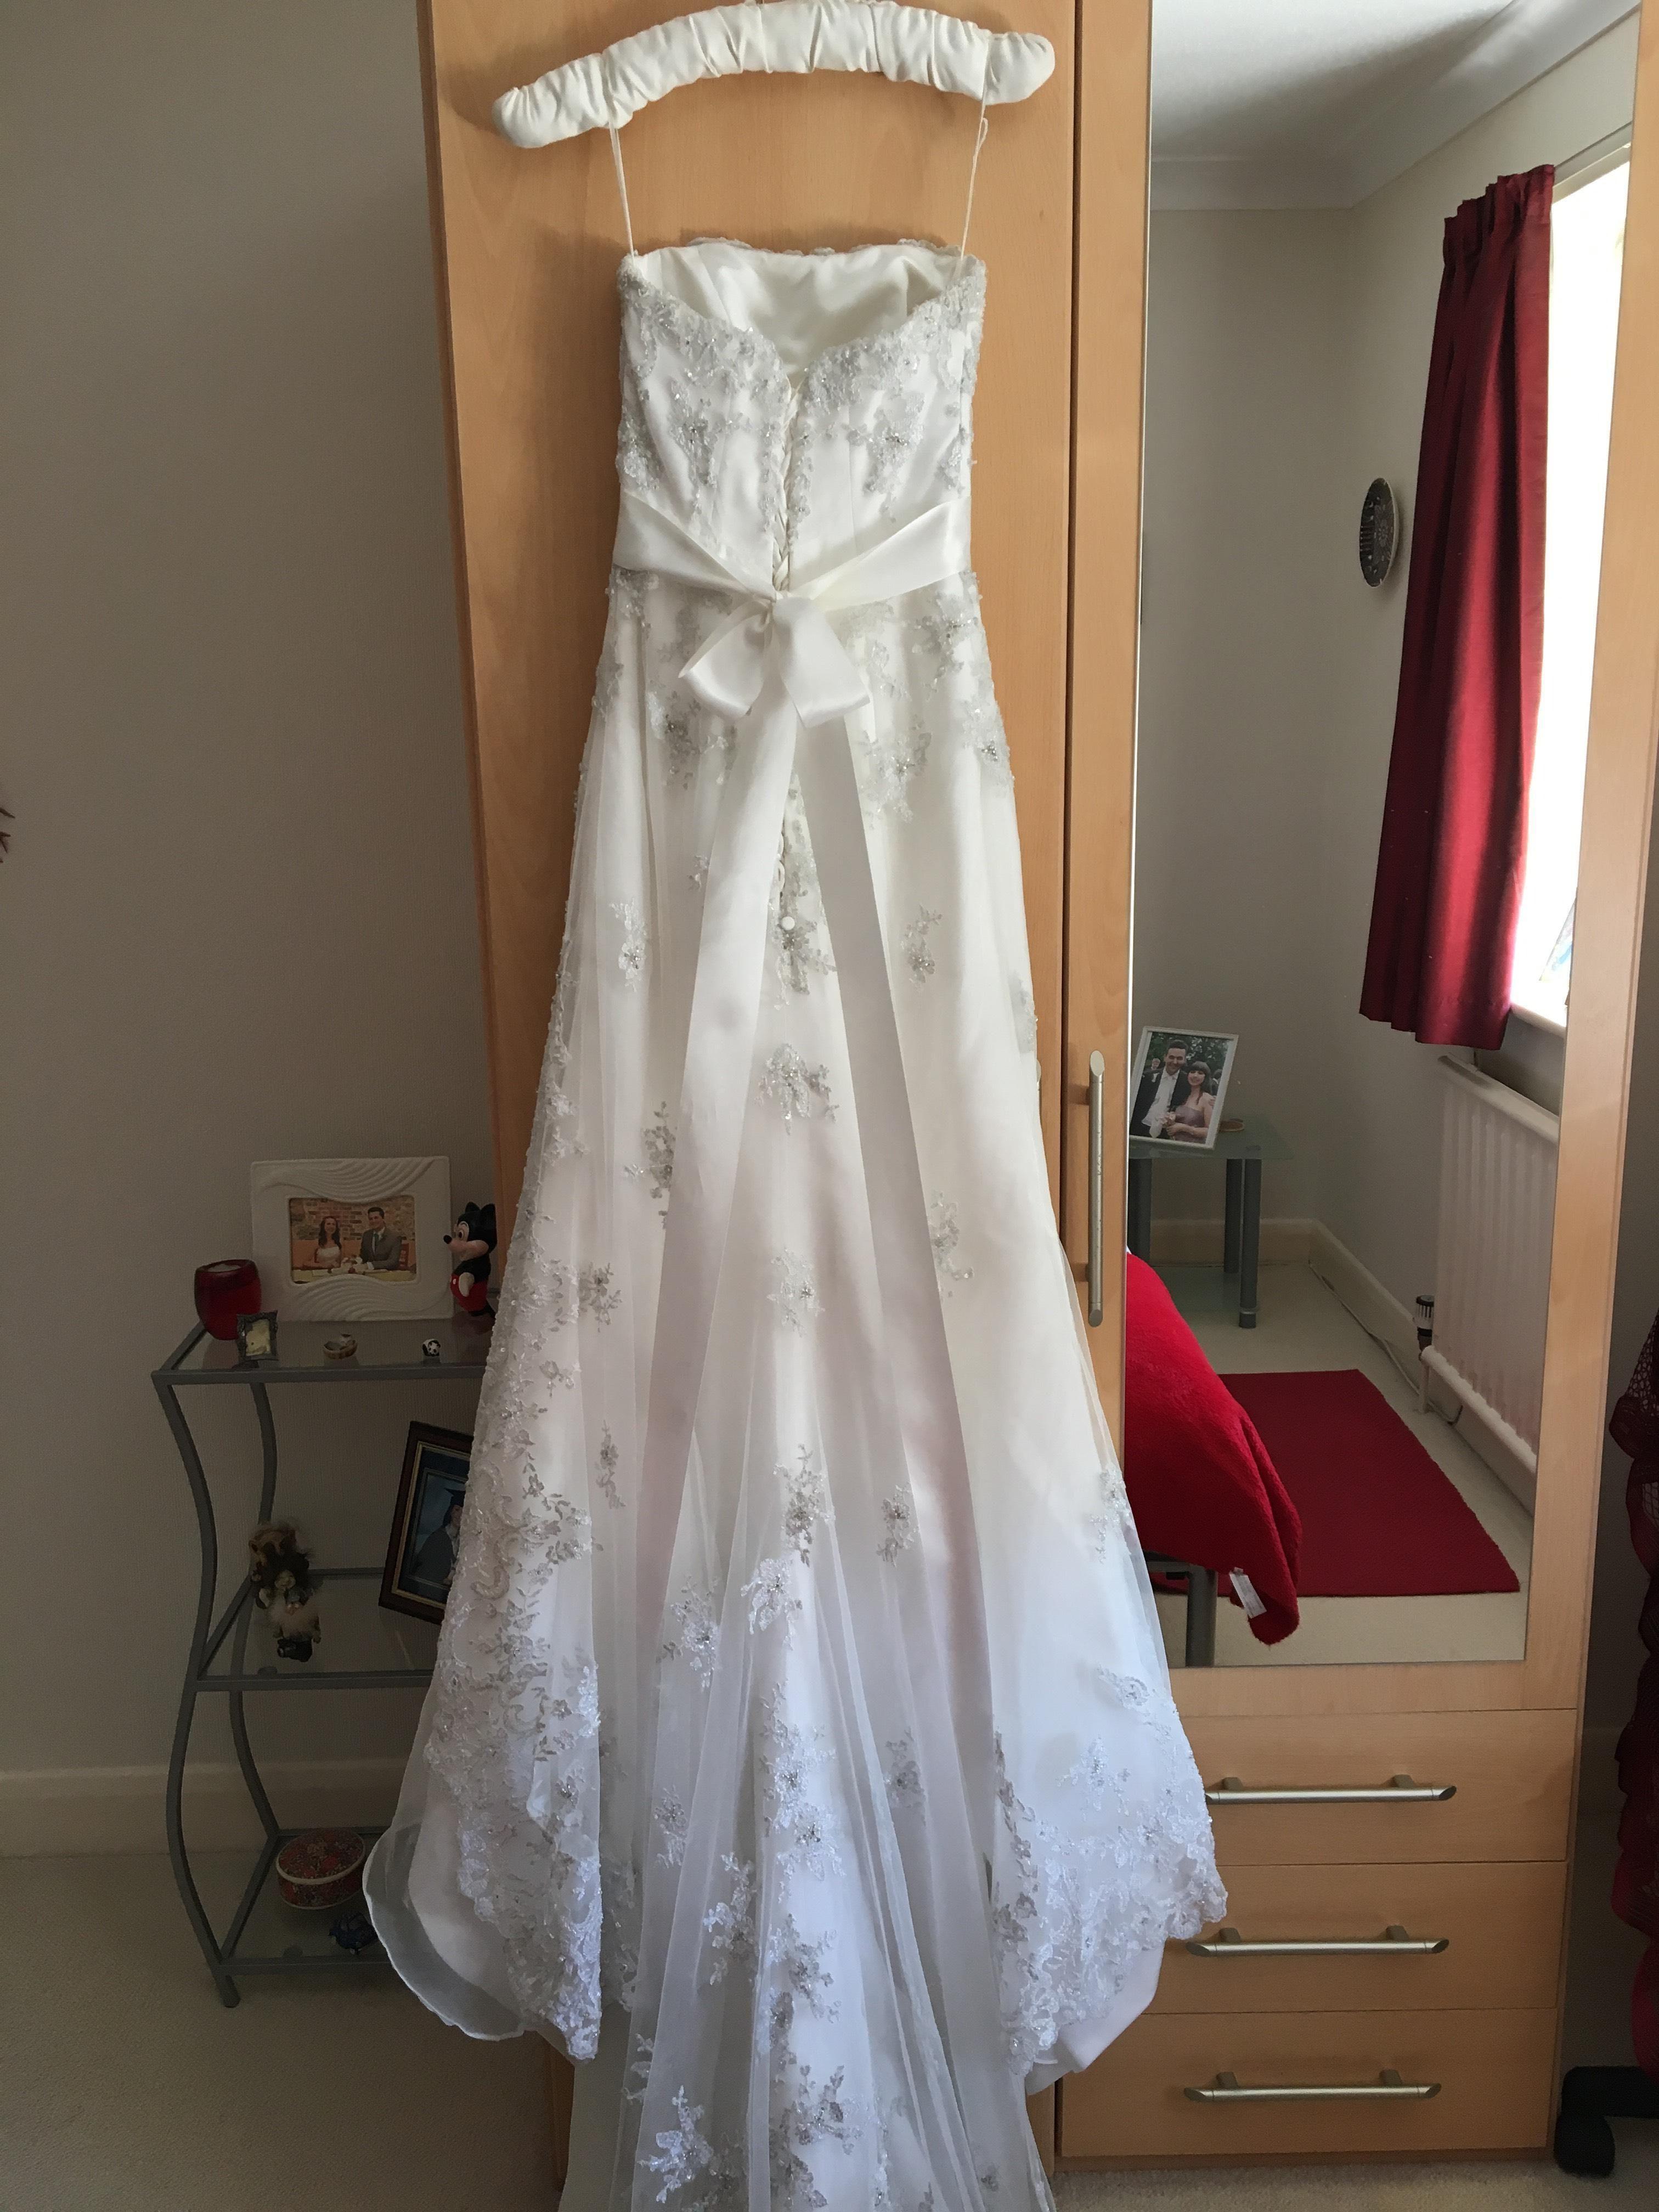 Maggie Sottero Tamara Dress Size 6 8 Sell My Wedding Dress 450 00 In Stock Sell My Wedding Dress Online Wedding Dress Dresses